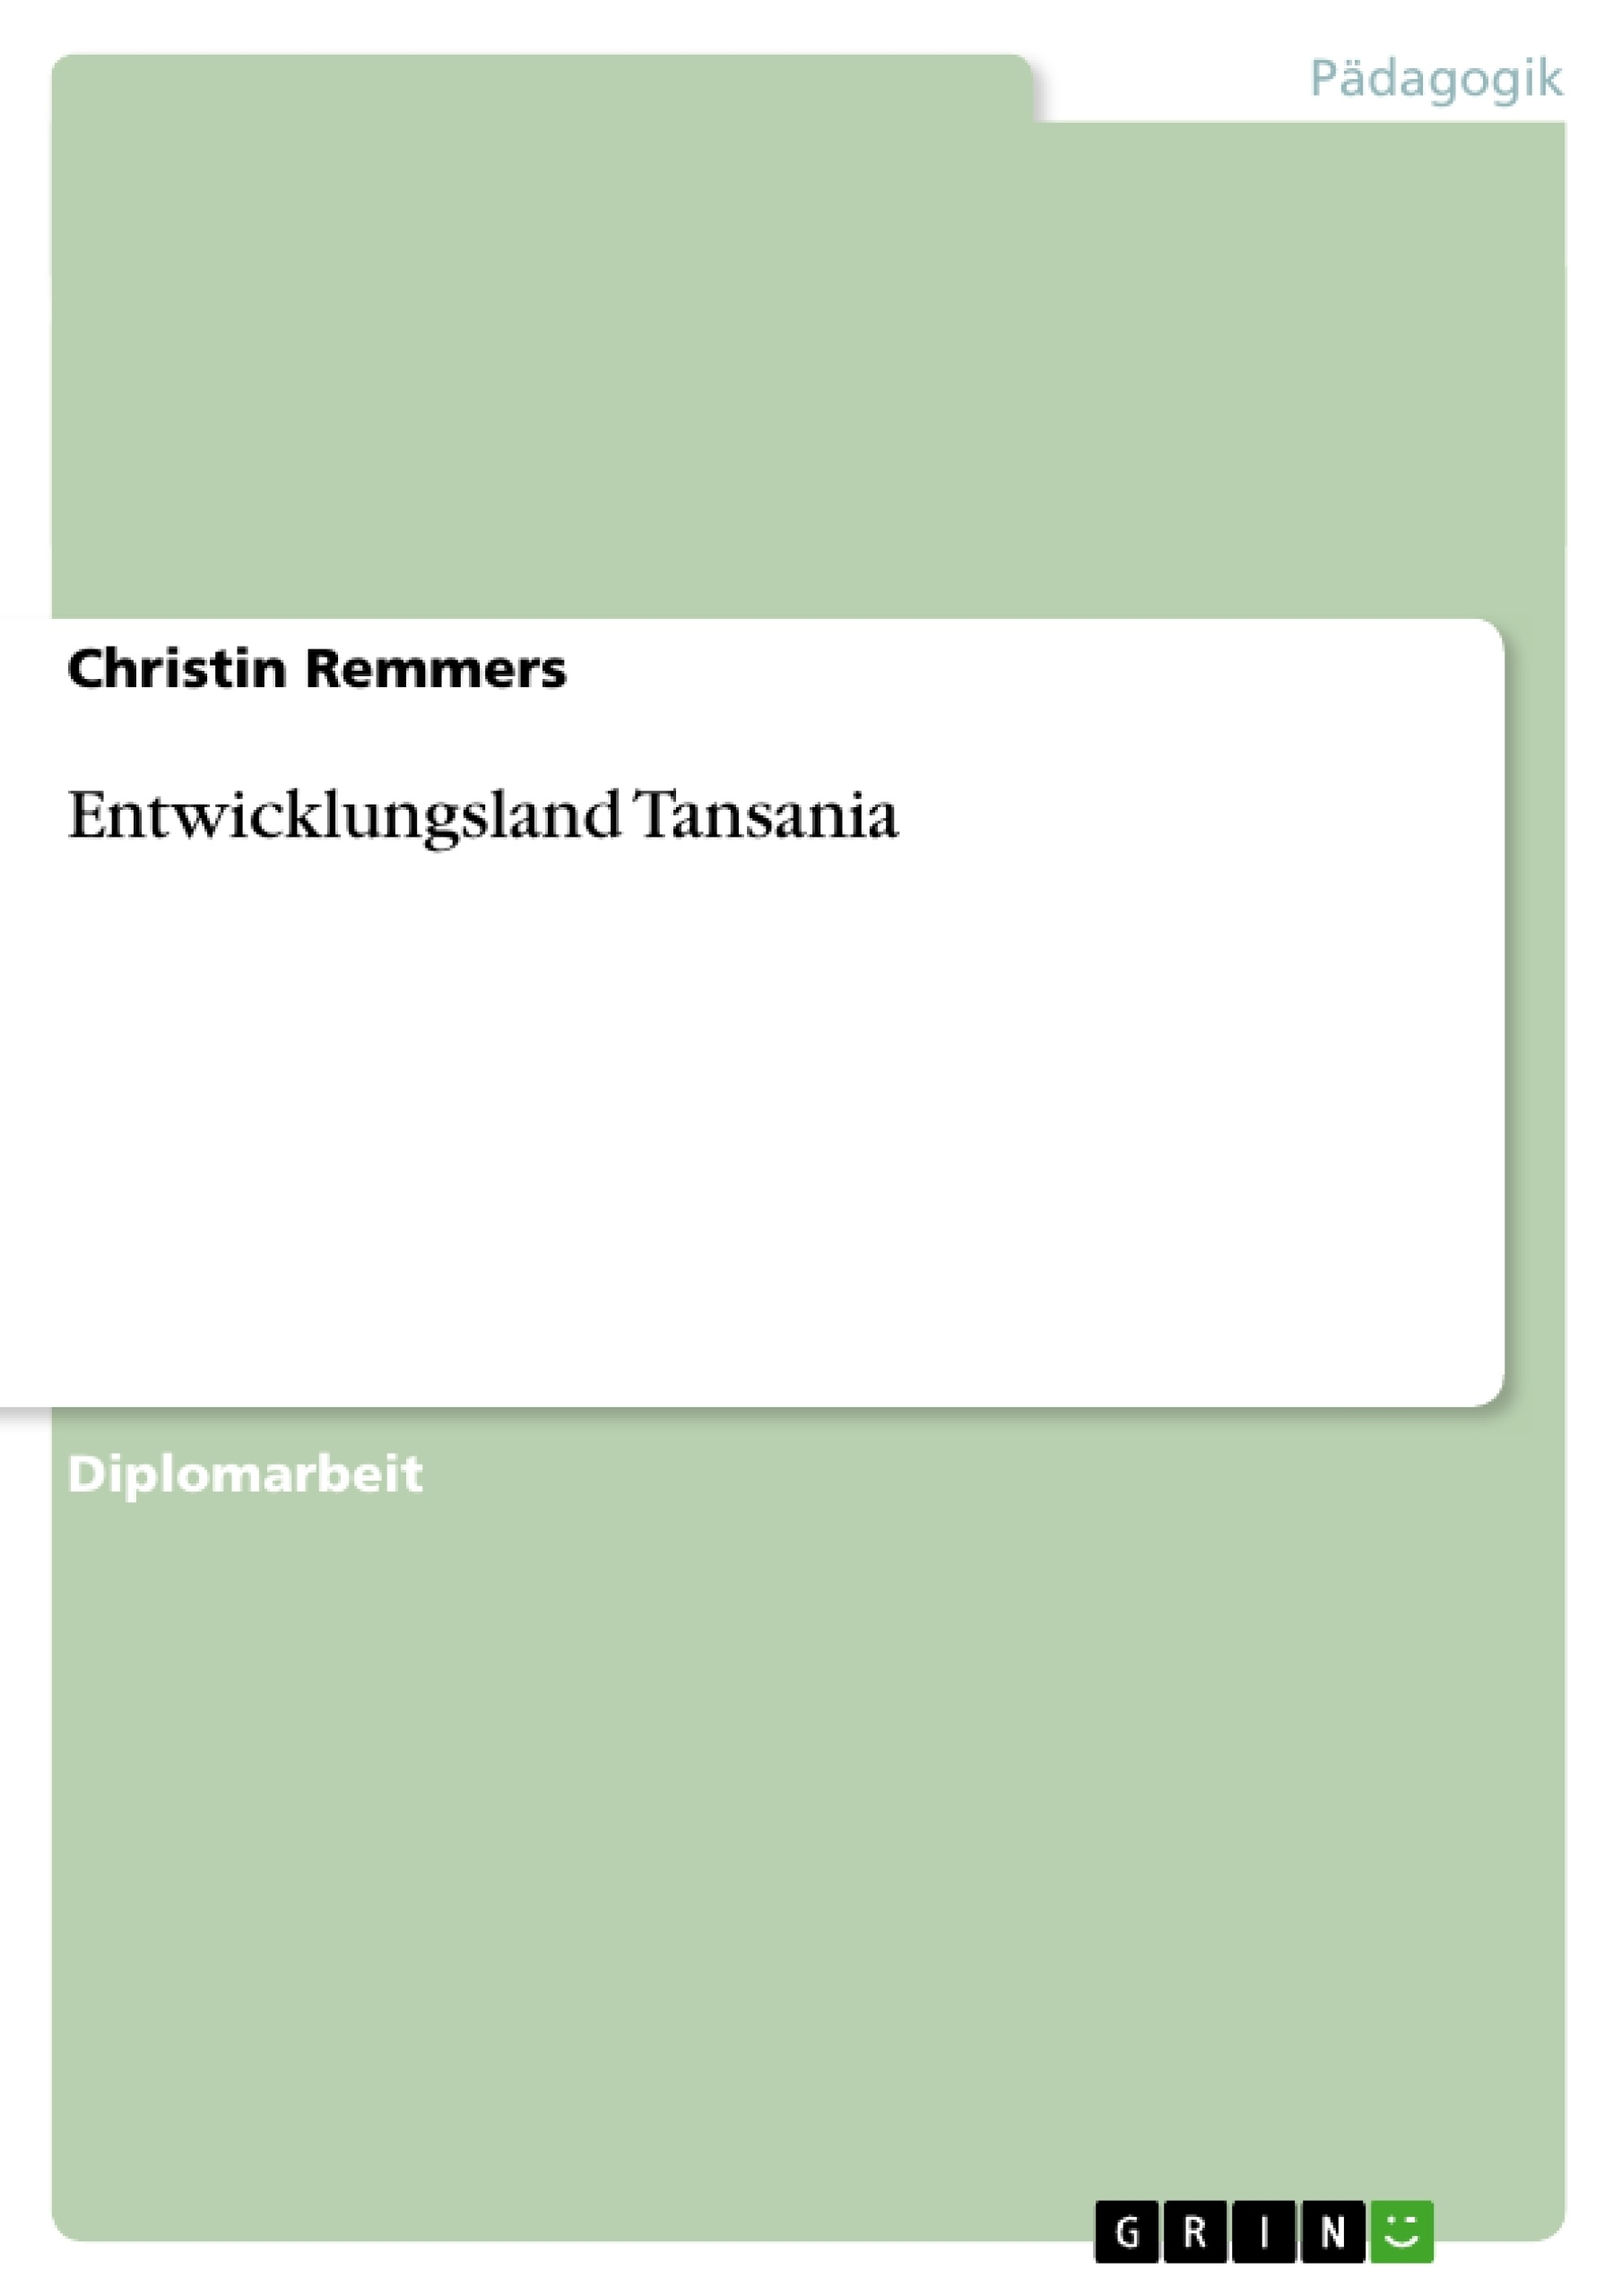 Titel: Entwicklungsland Tansania